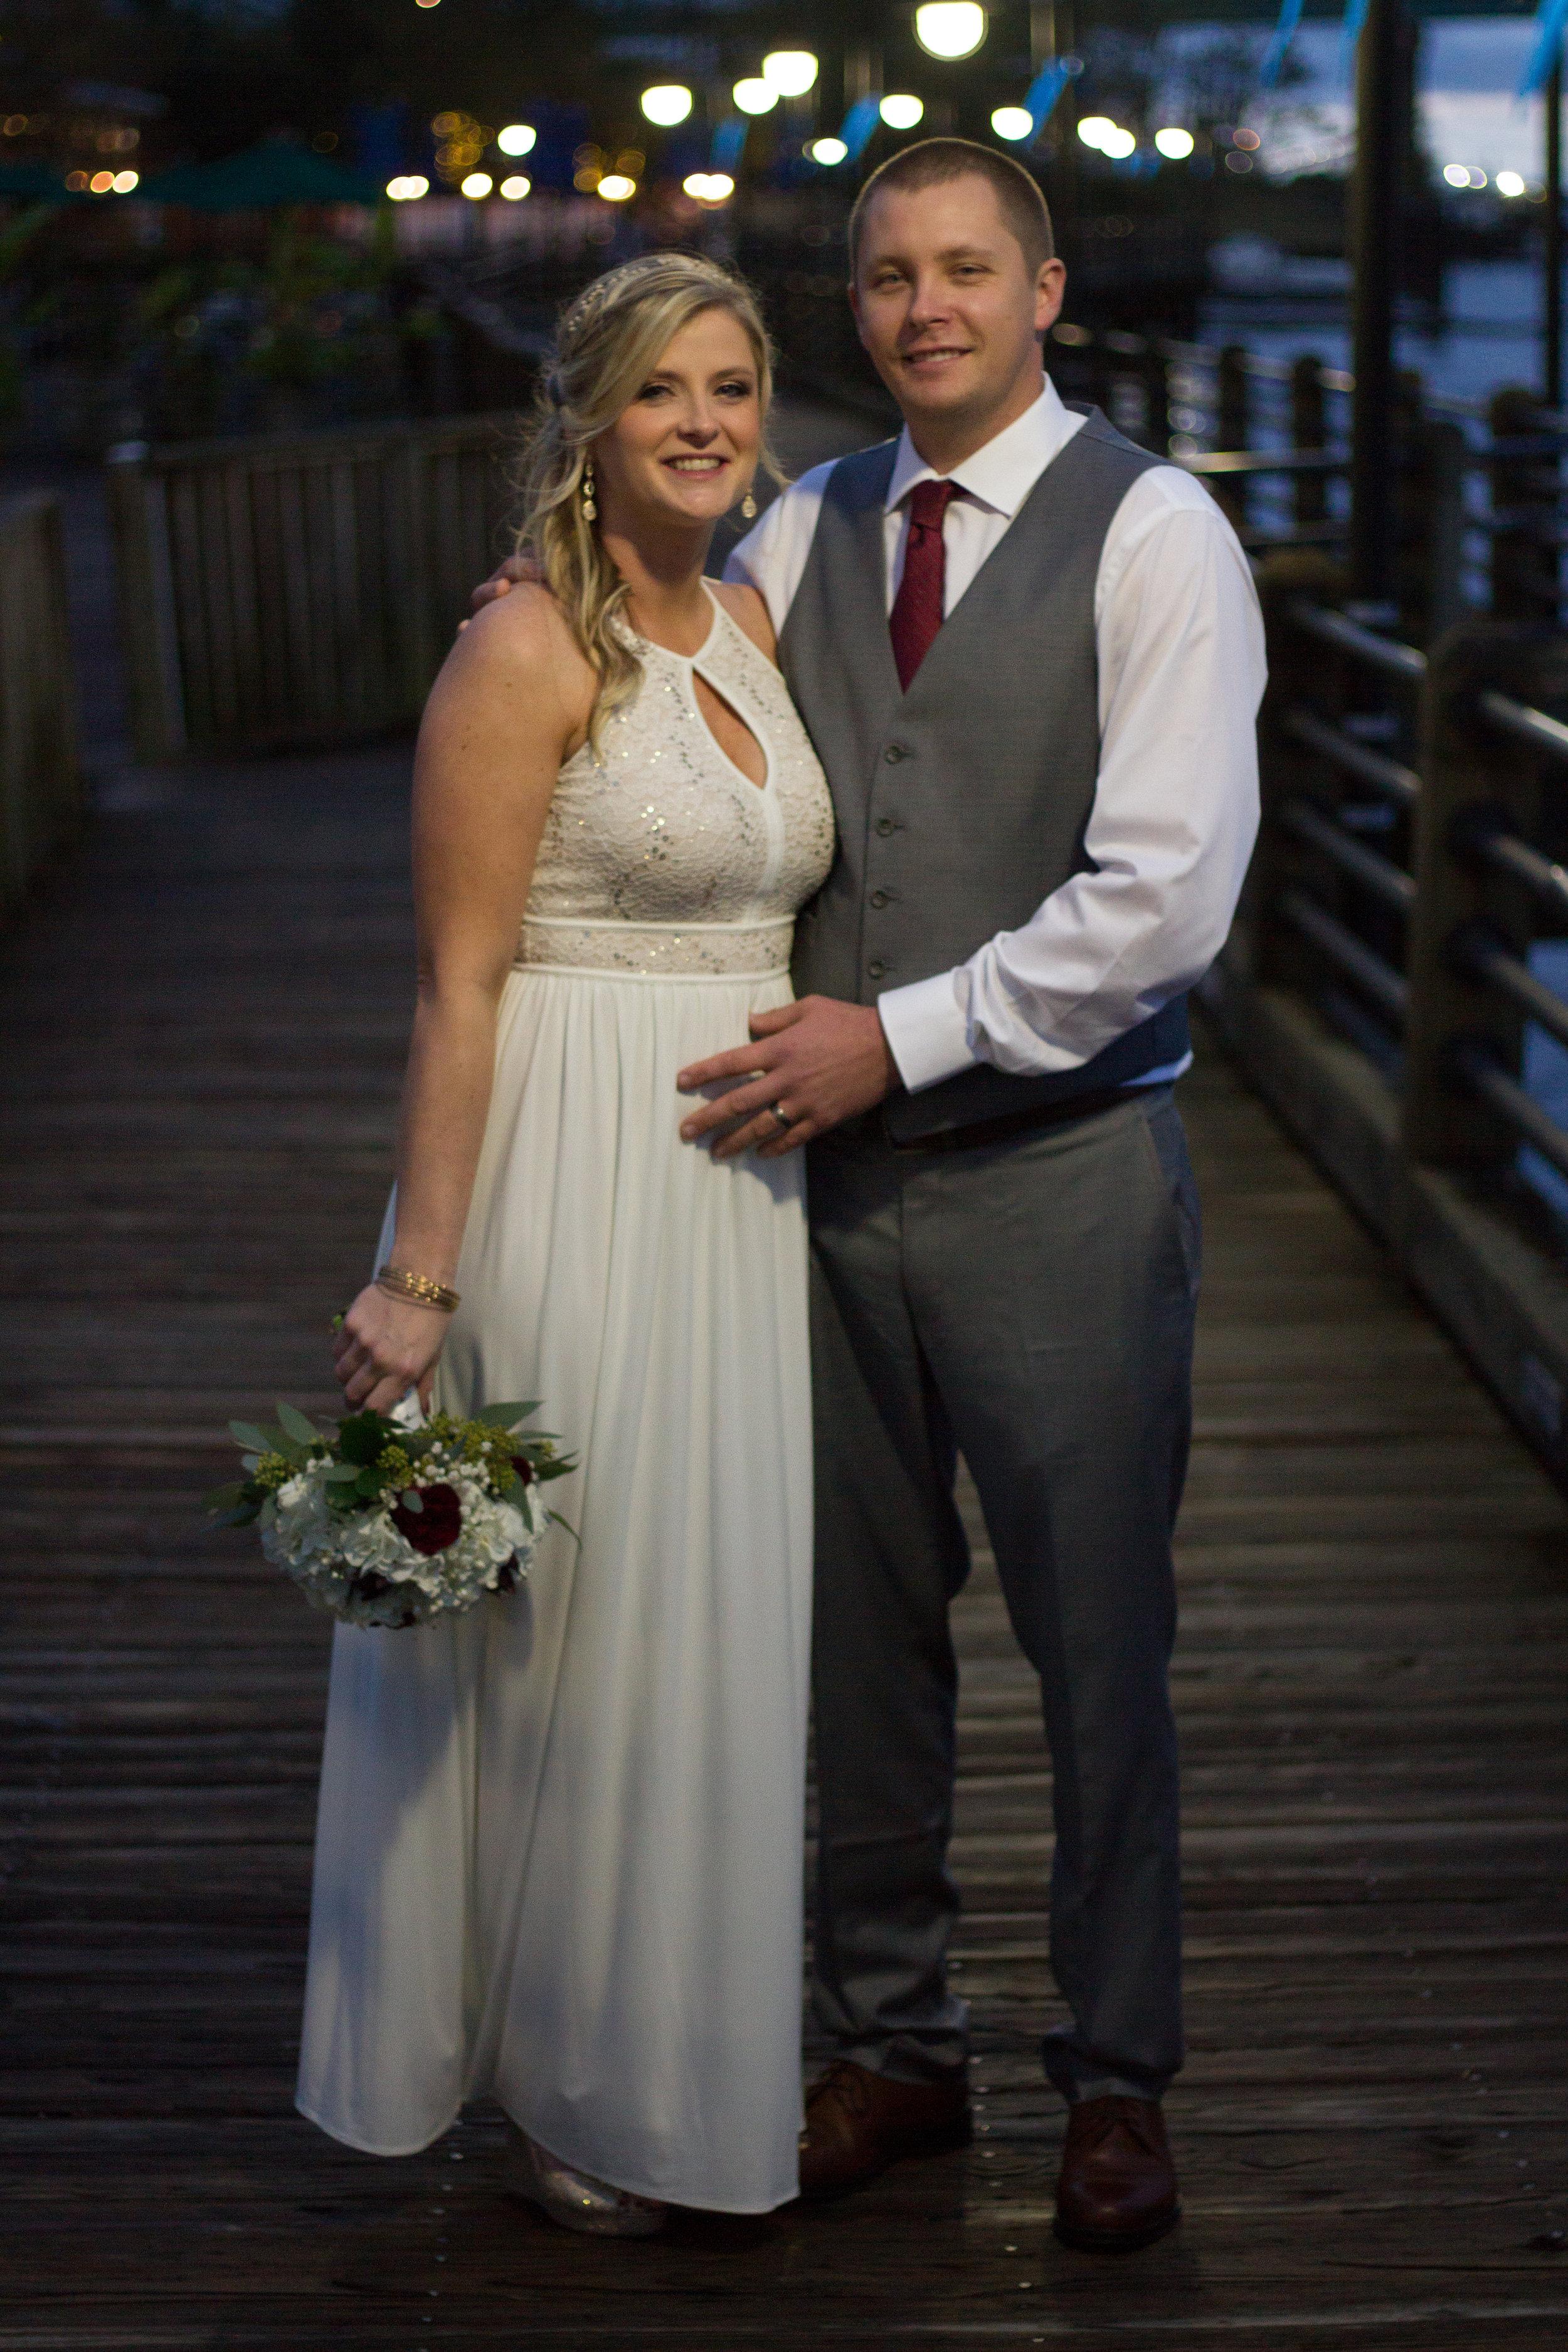 Clare and Kurt Wedding Photos (85 of 152).jpg